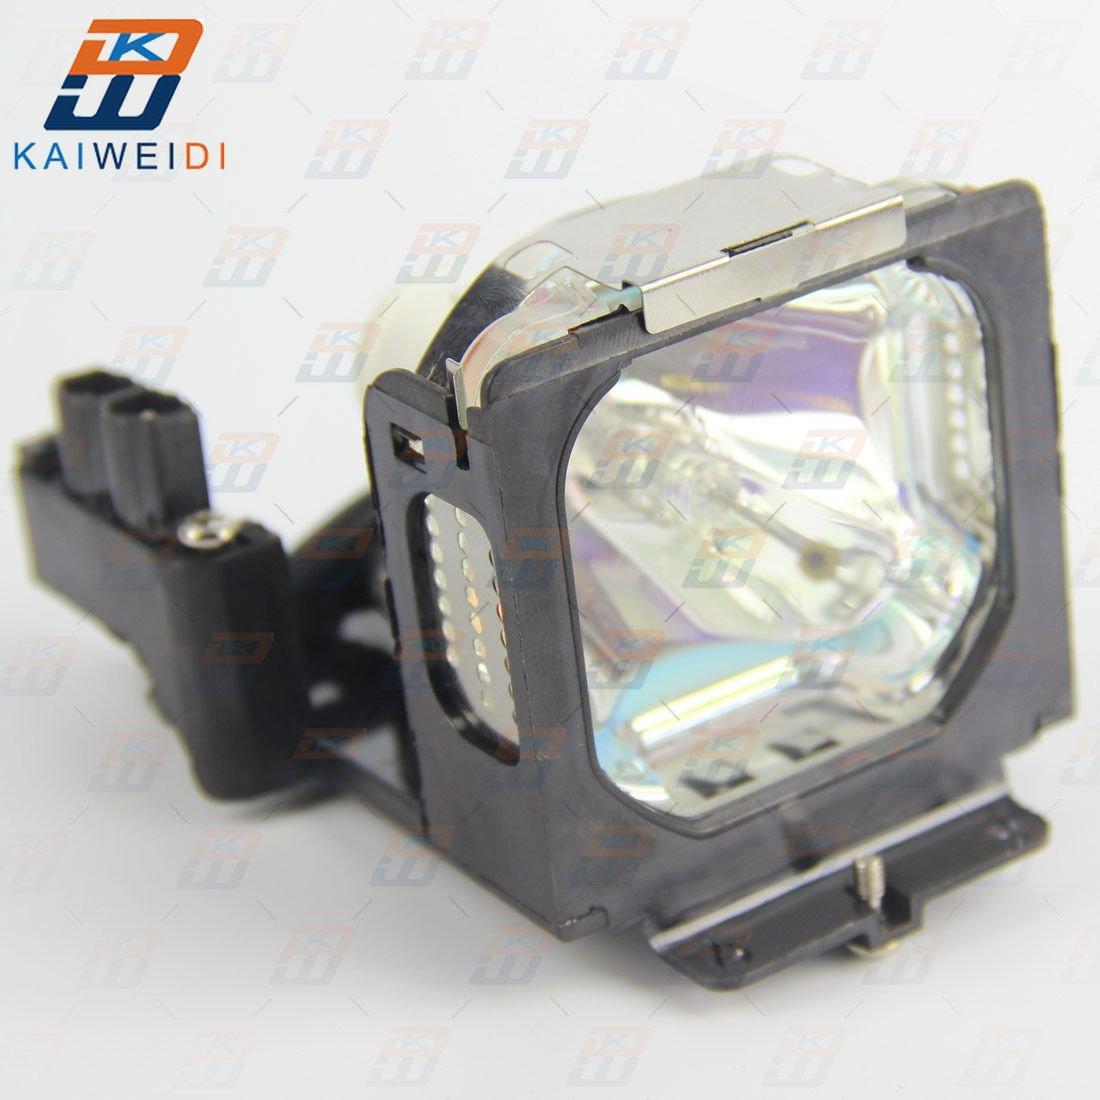 POA-LMP55 / 610-309-2706 LAMP For Sanyo PLC-SU55 PLC-XE20 PLC-XL20 PLC-XT15KS PLC-XT15KU PLC-XU25 PLC-XU2510 PLC-XU47 PLC-XU48